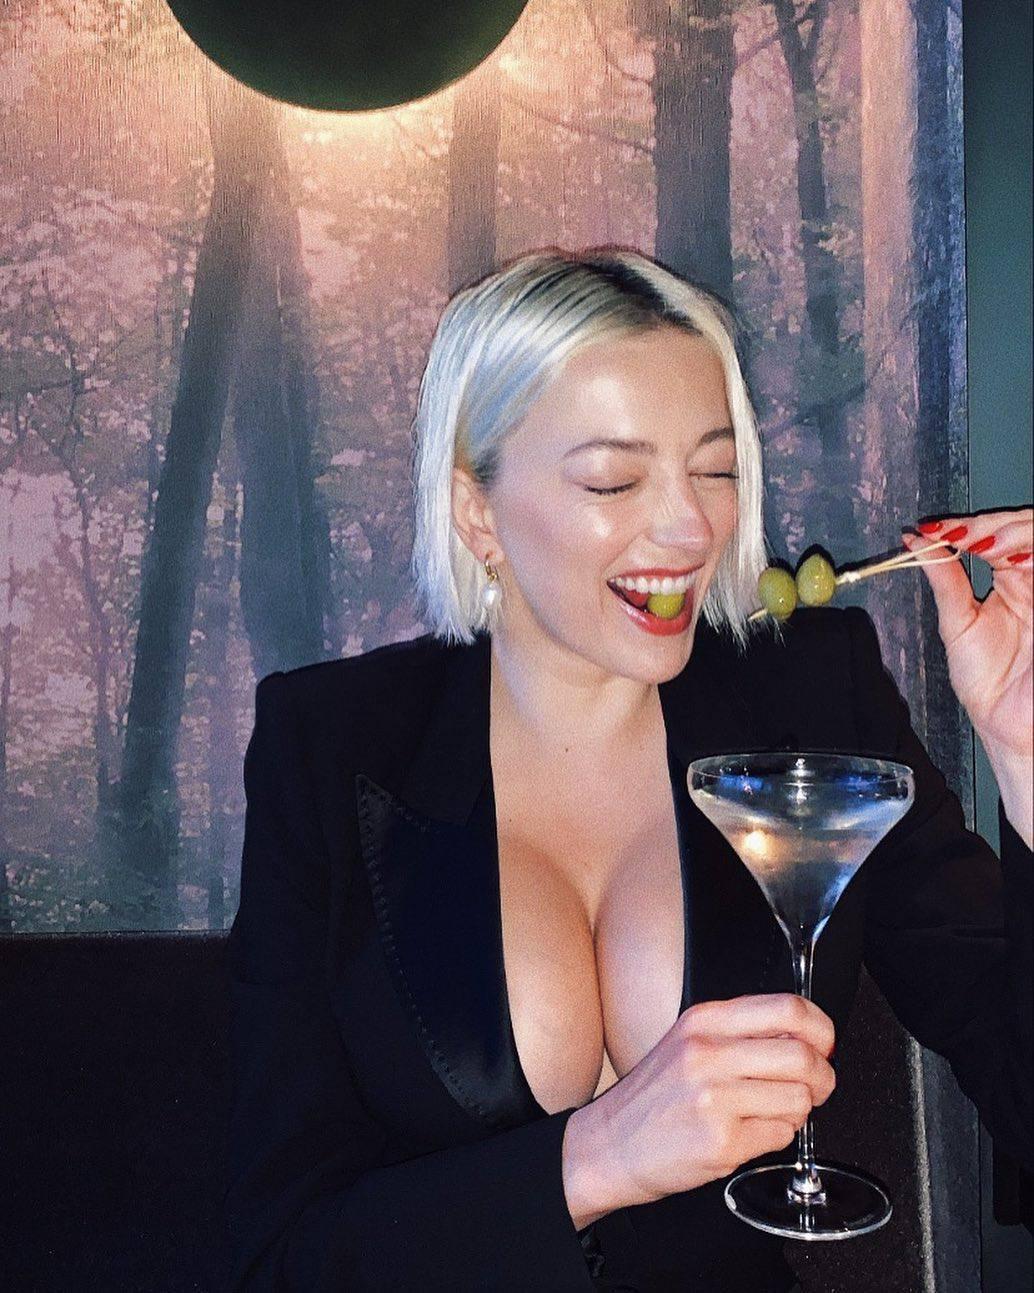 Caroline Vreeland Magnificent Boobs